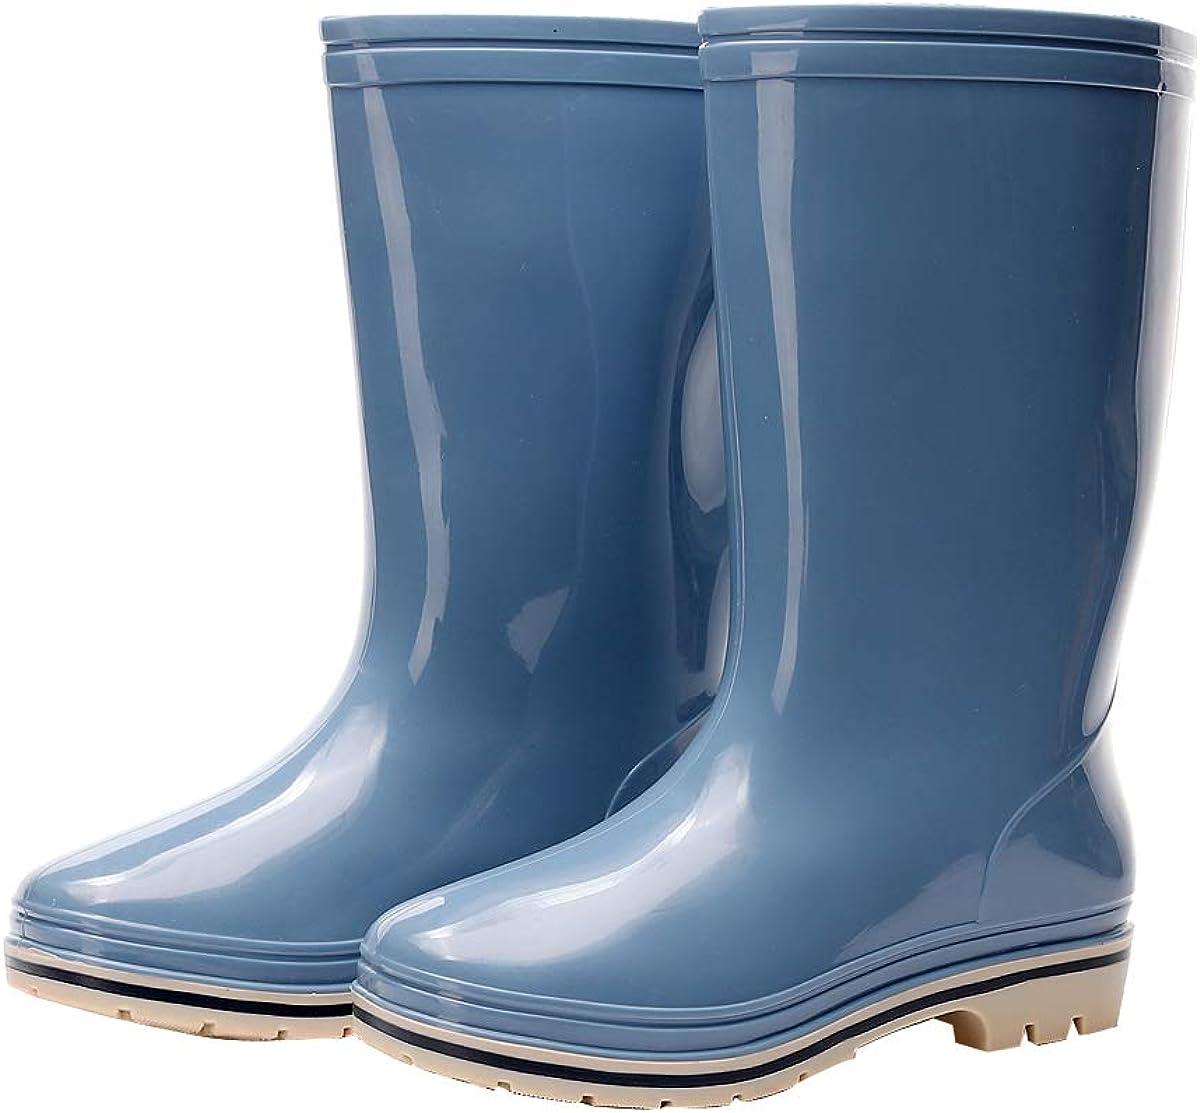 Womens Rain and Garden Boot Wellies Half Calf Rubber Waterproof for Garden Women rain footwear